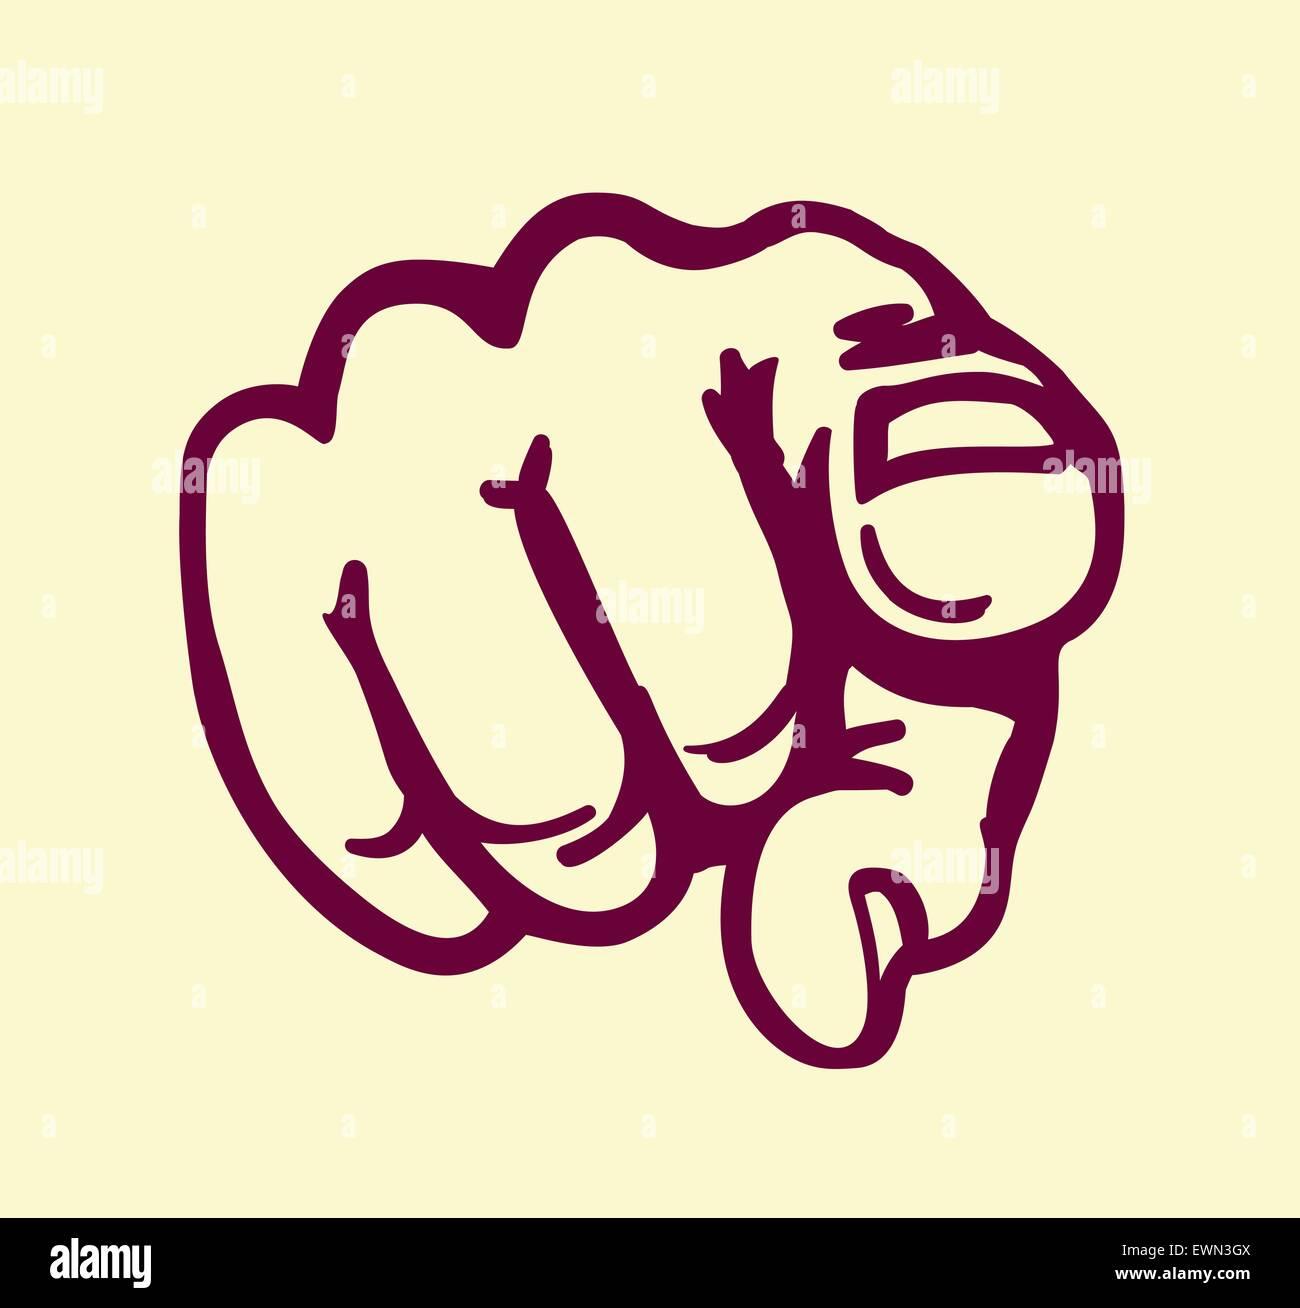 I want you! vintage pointing finger vector illustration, design element - Stock Vector